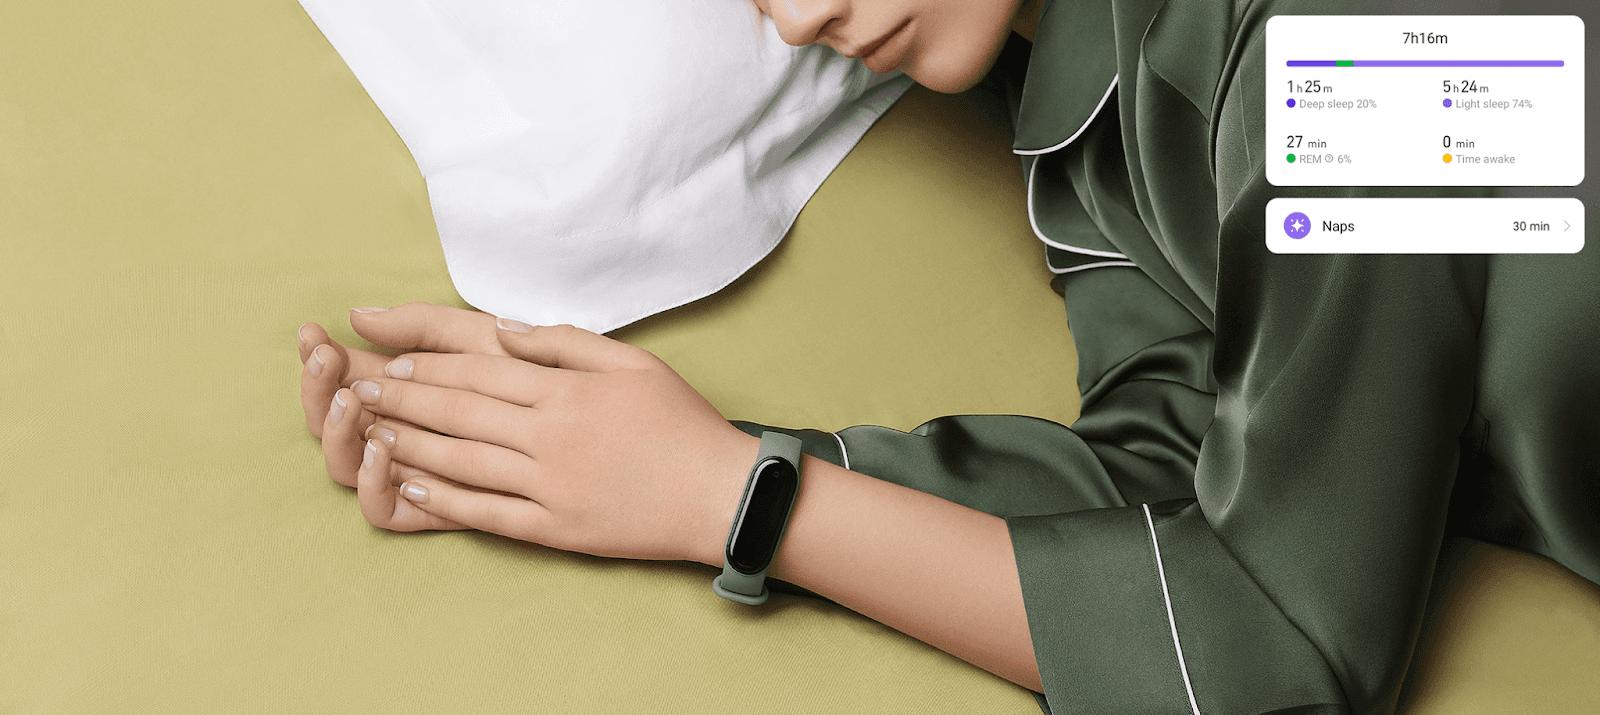 Xiaomi mi band 5 показники сну